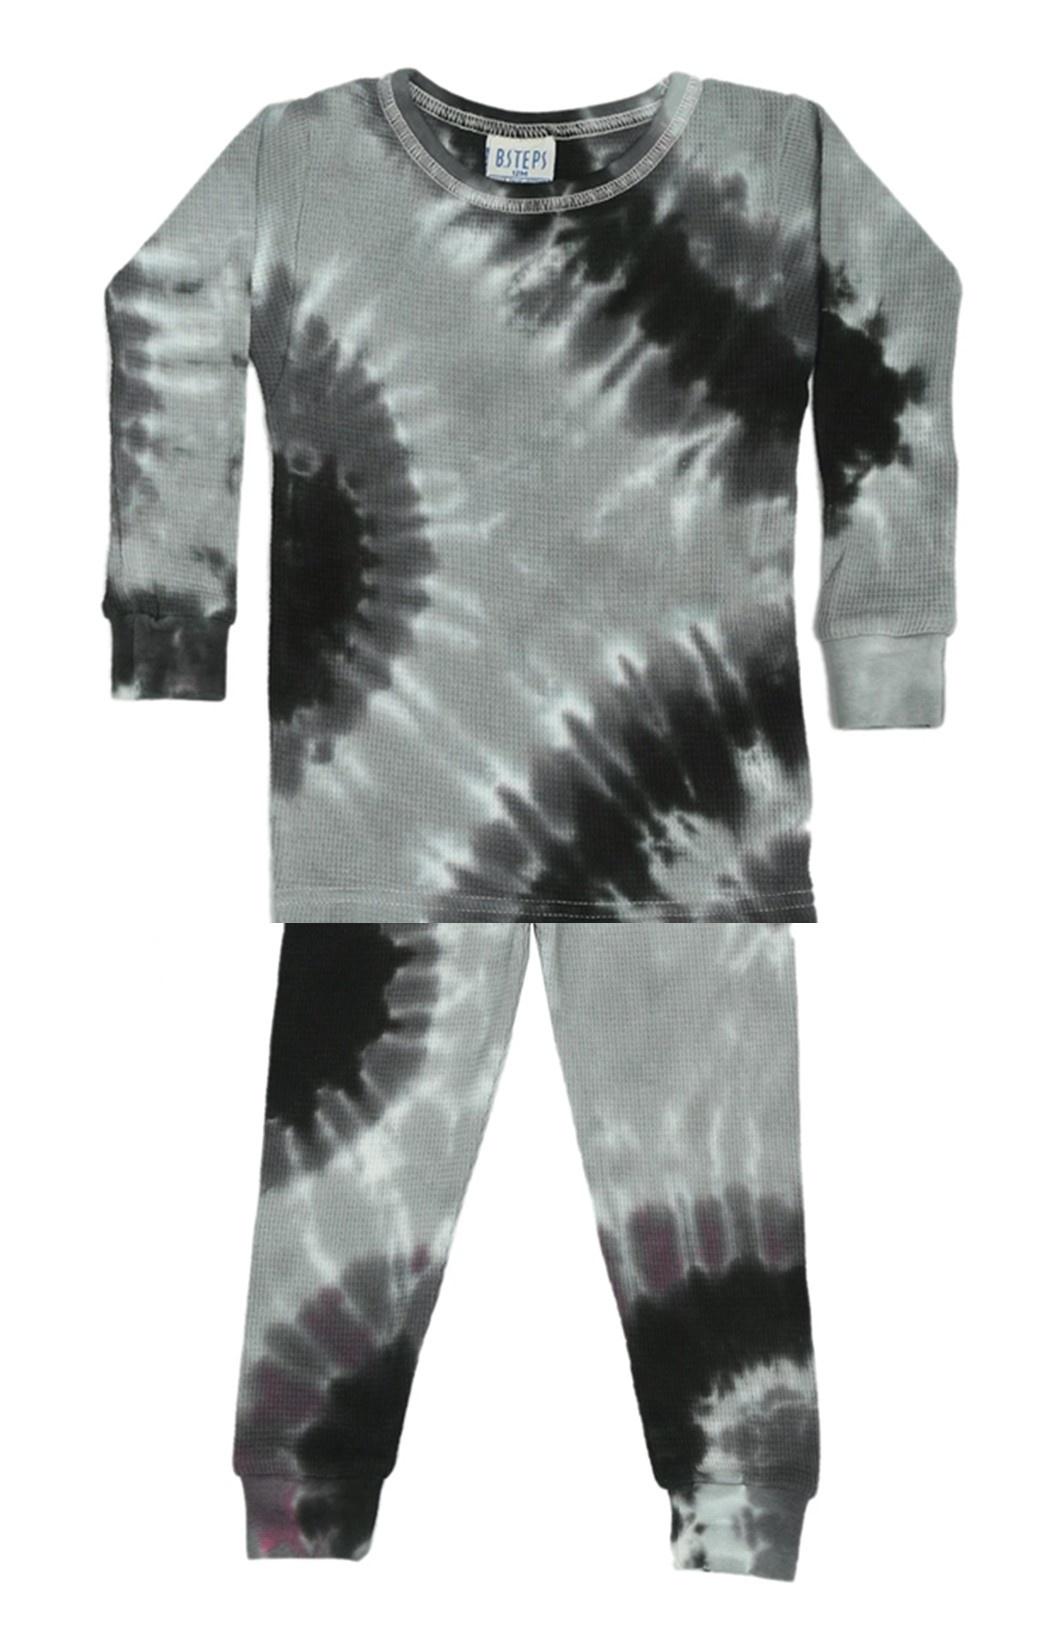 Baby Steps Stormy Tie Dye Thermal Infant PJ Set